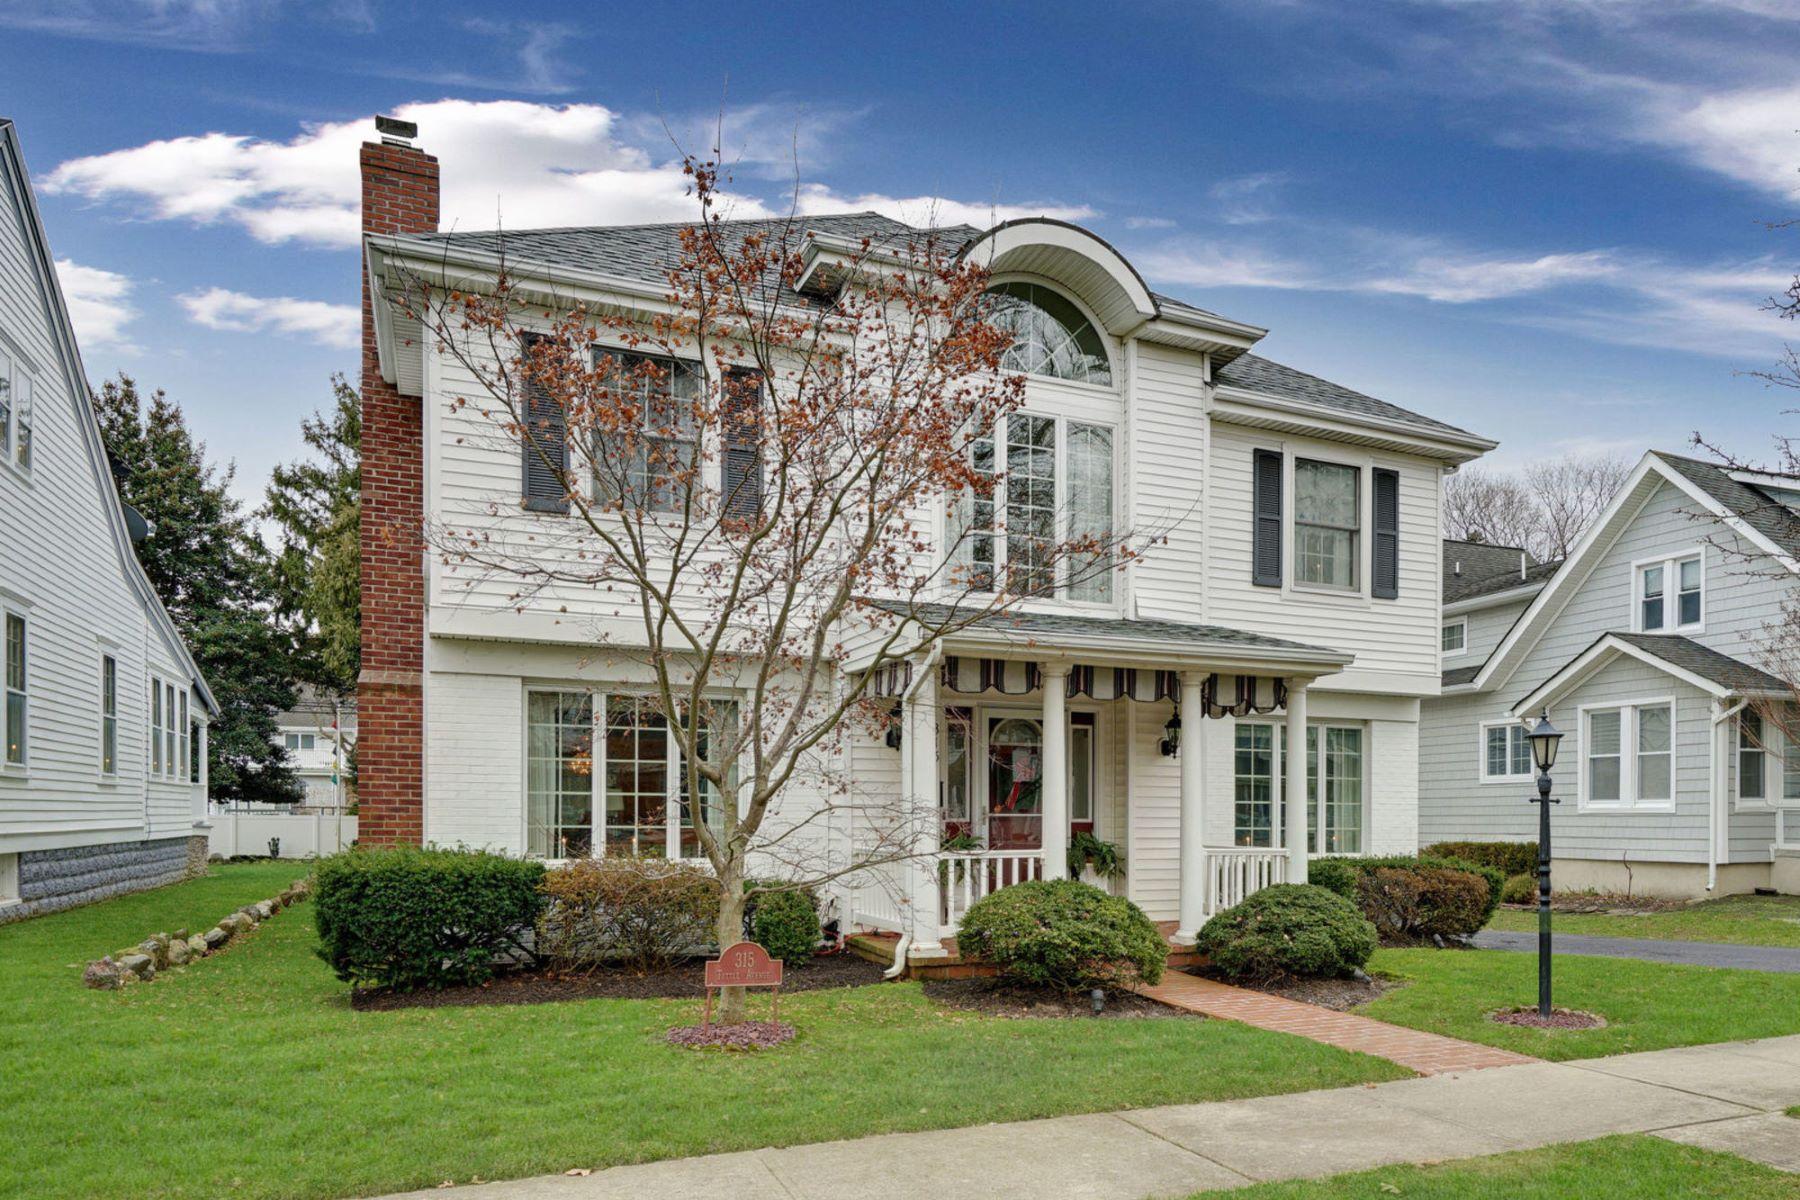 Property 为 出租 在 Immaculate Summer Rental in Spring Lake 315 Tuttle Avenue, 斯普林莱克, 新泽西州 07762 美国